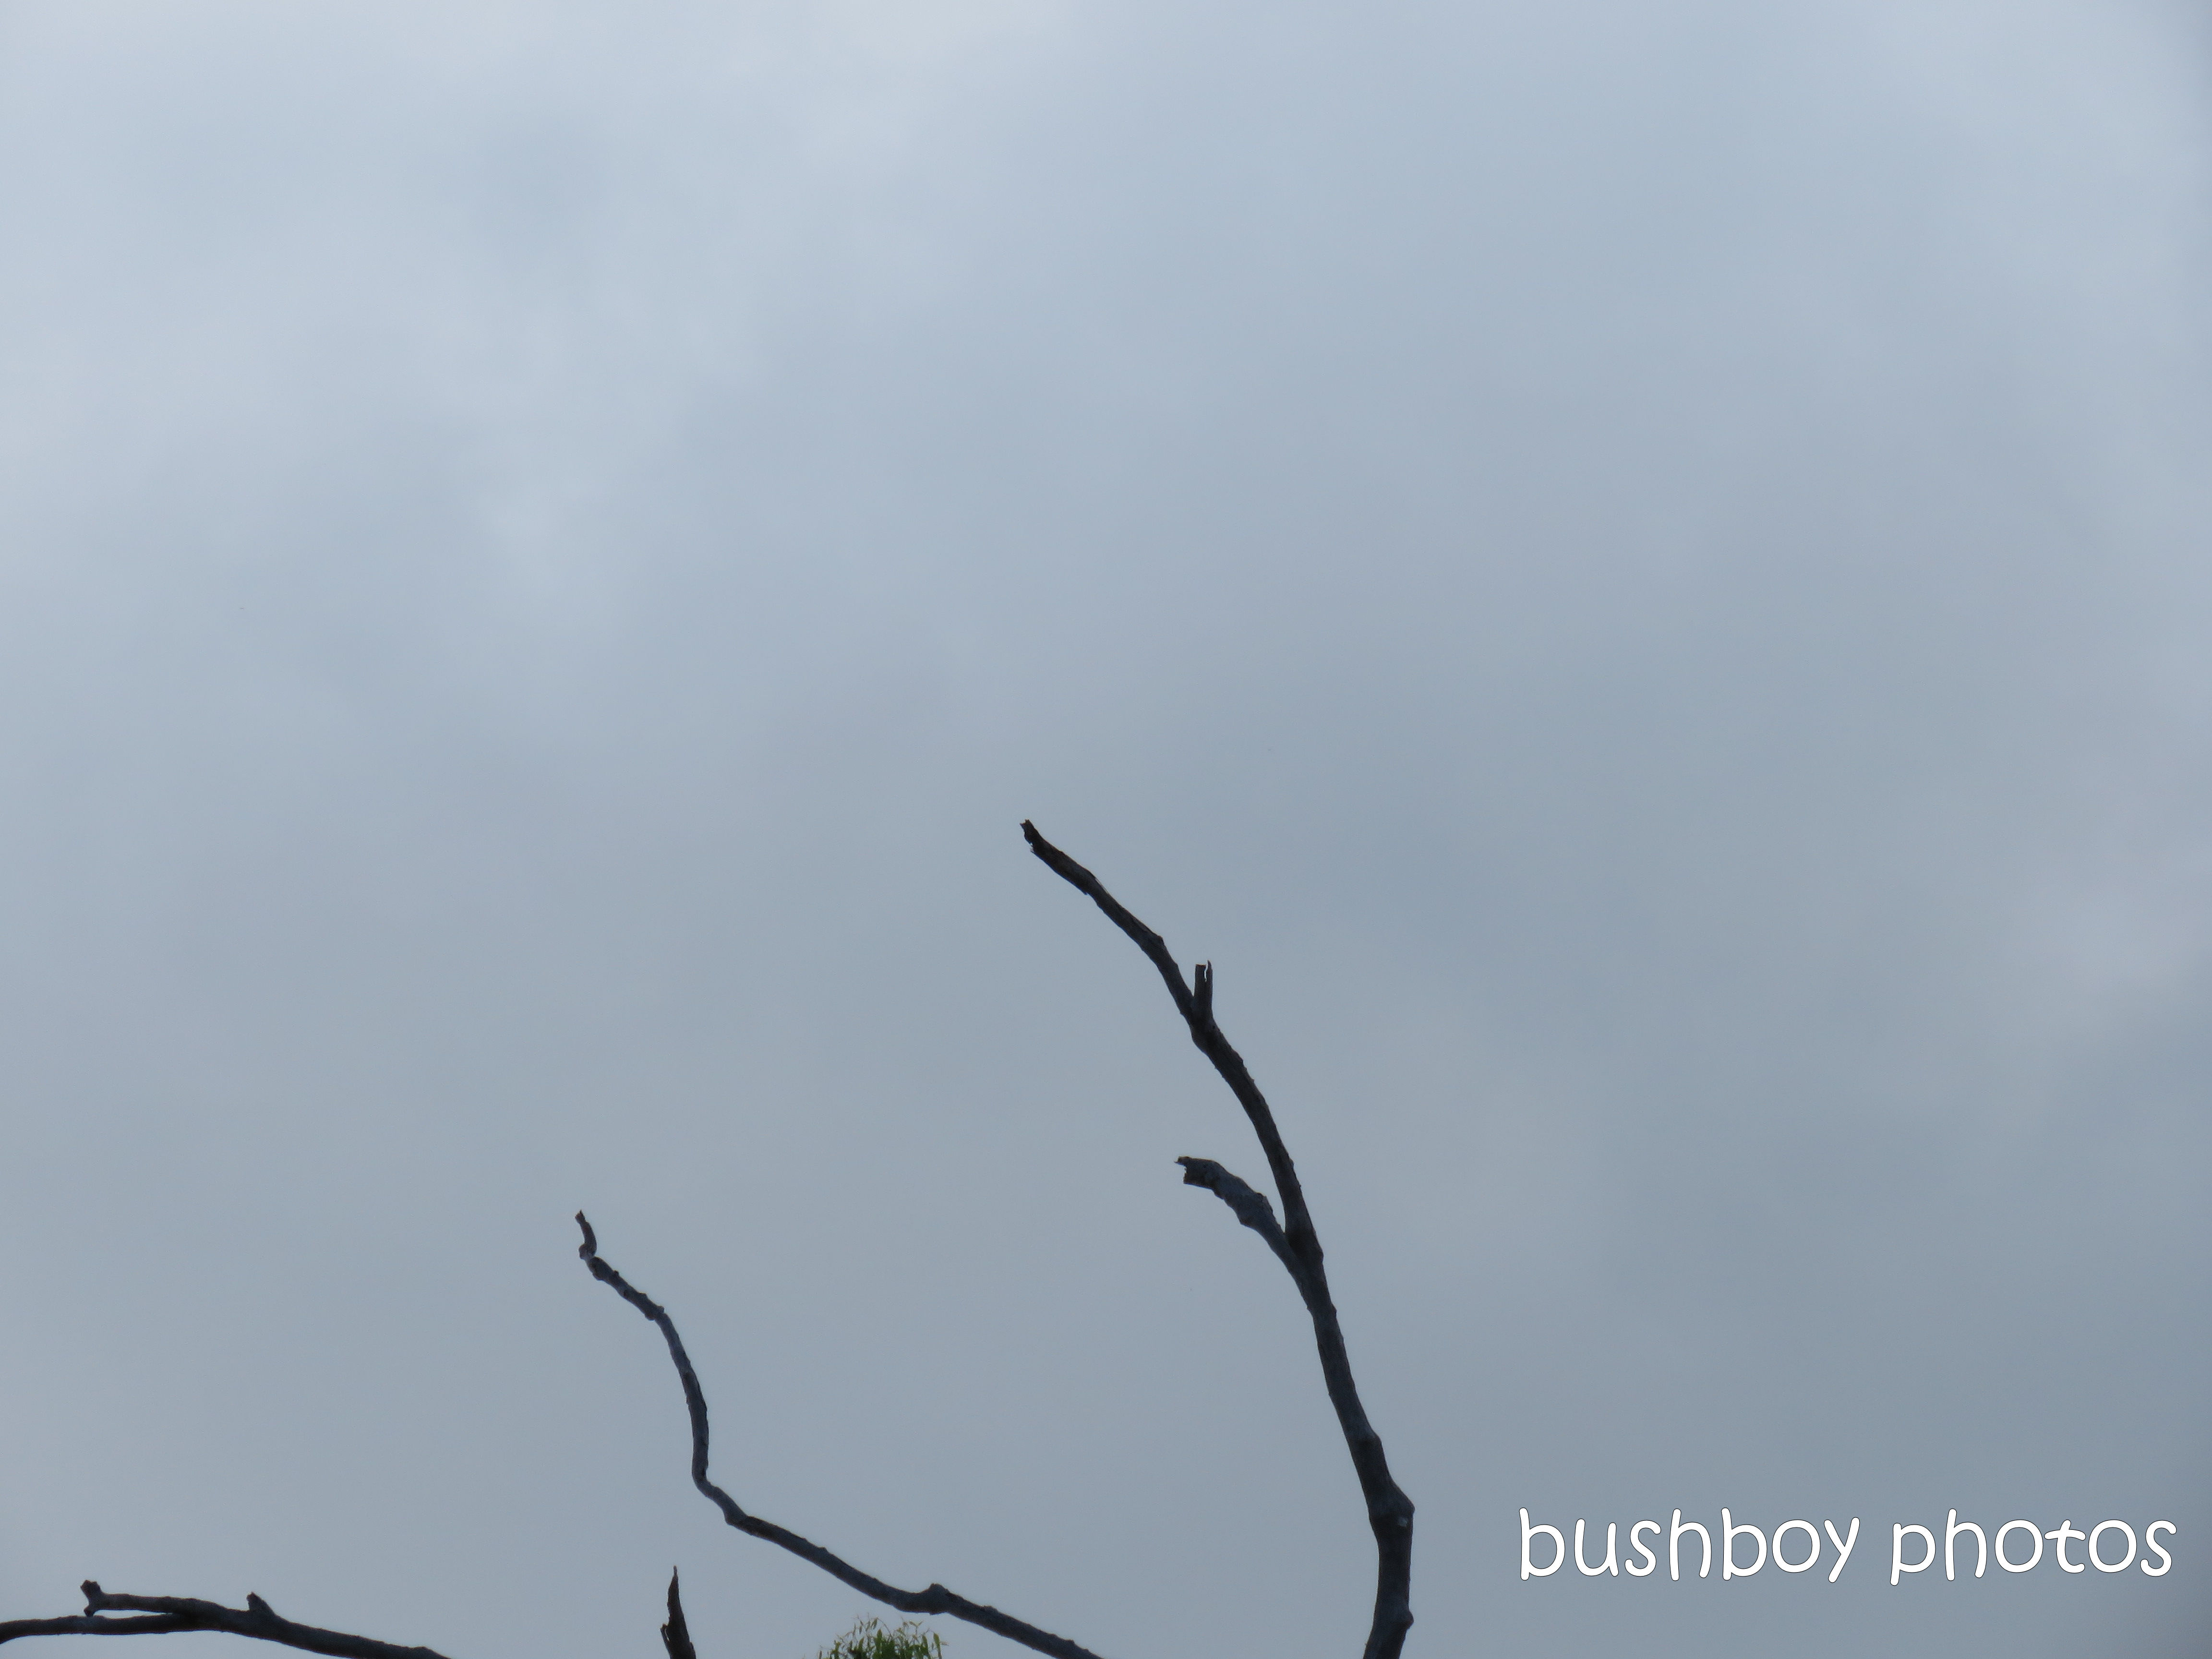 20200122_blog_challenge_tree_sky_minimalism